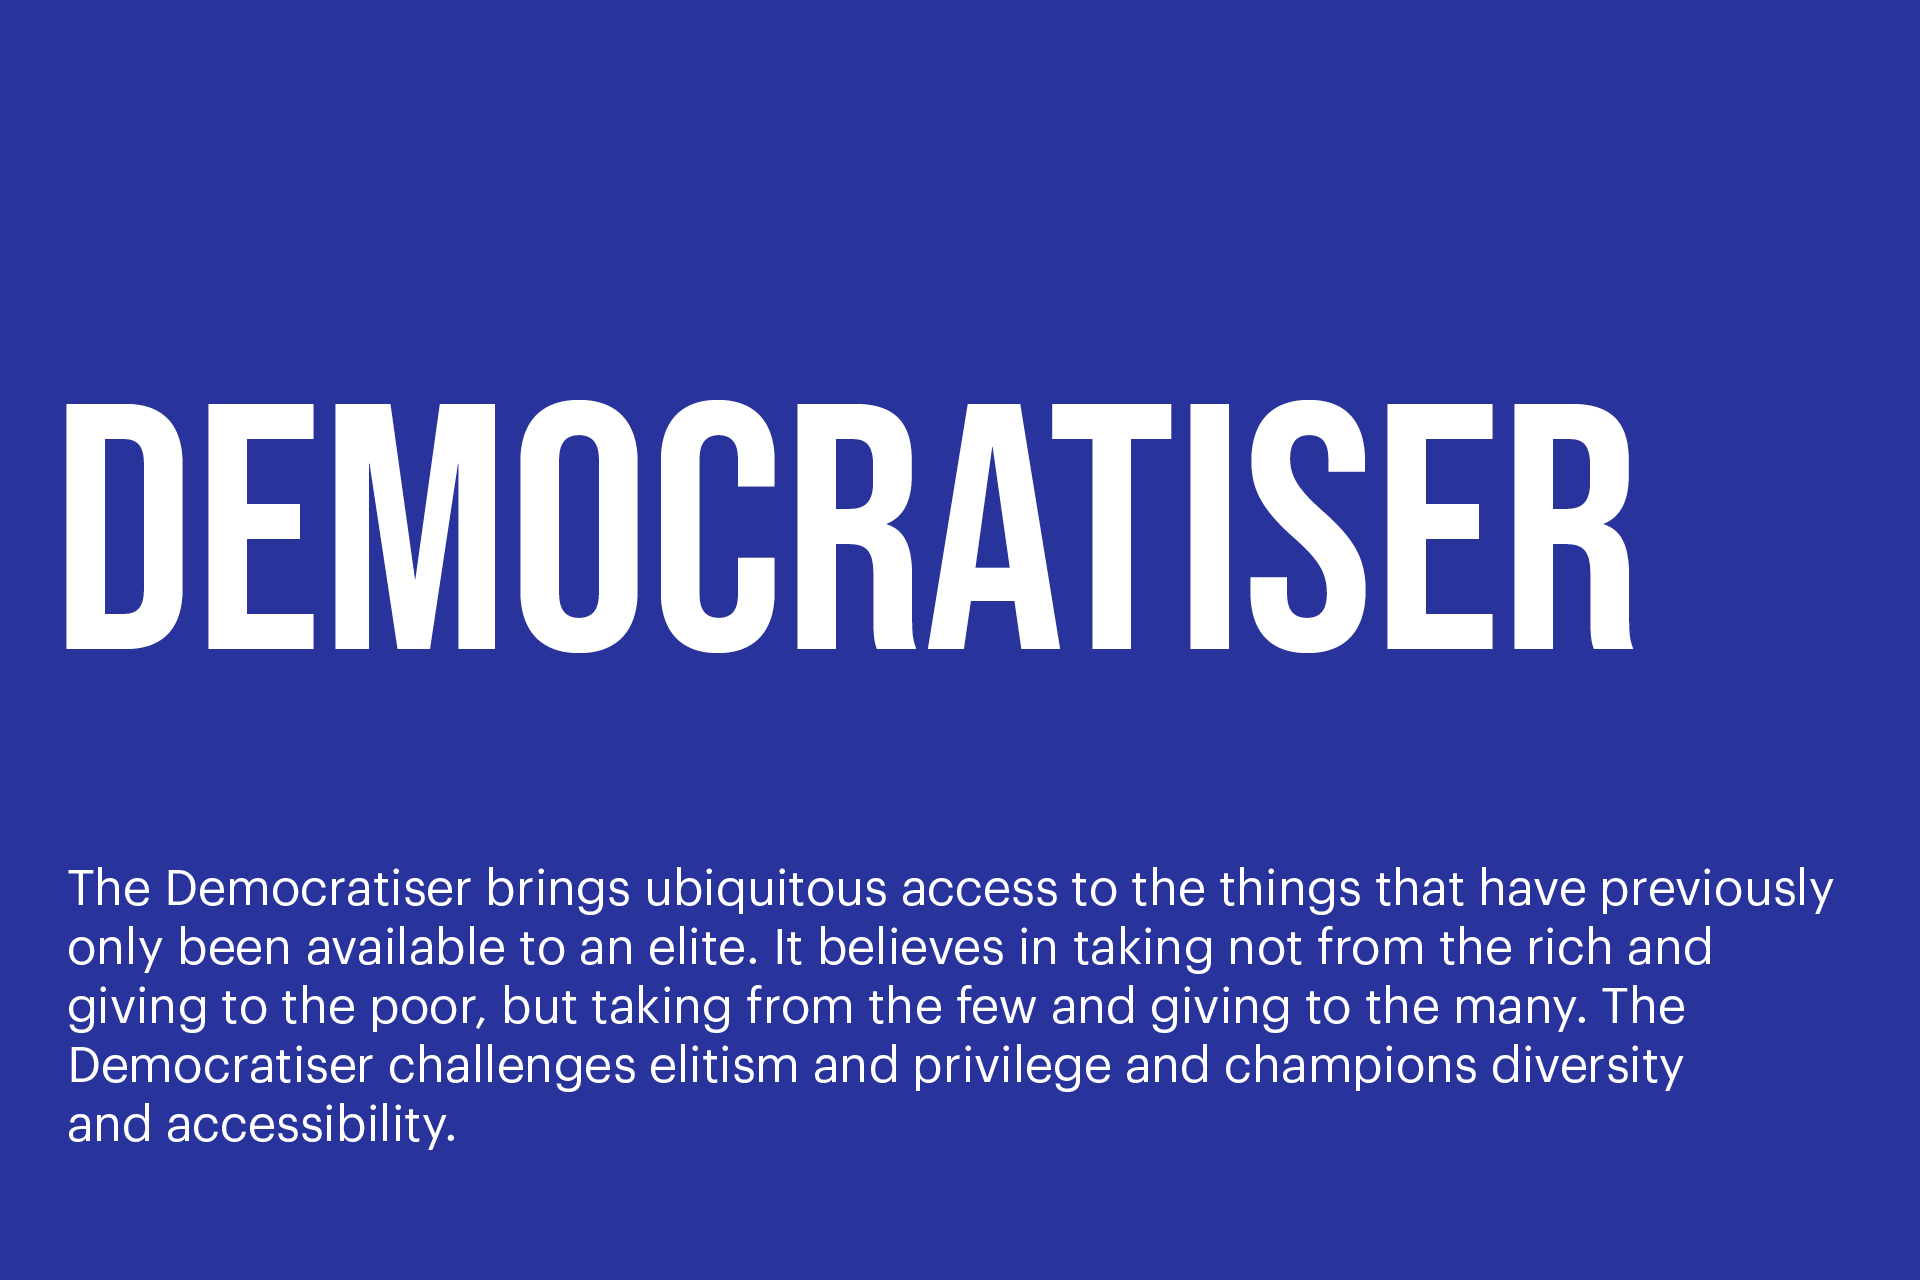 Democratiser.png